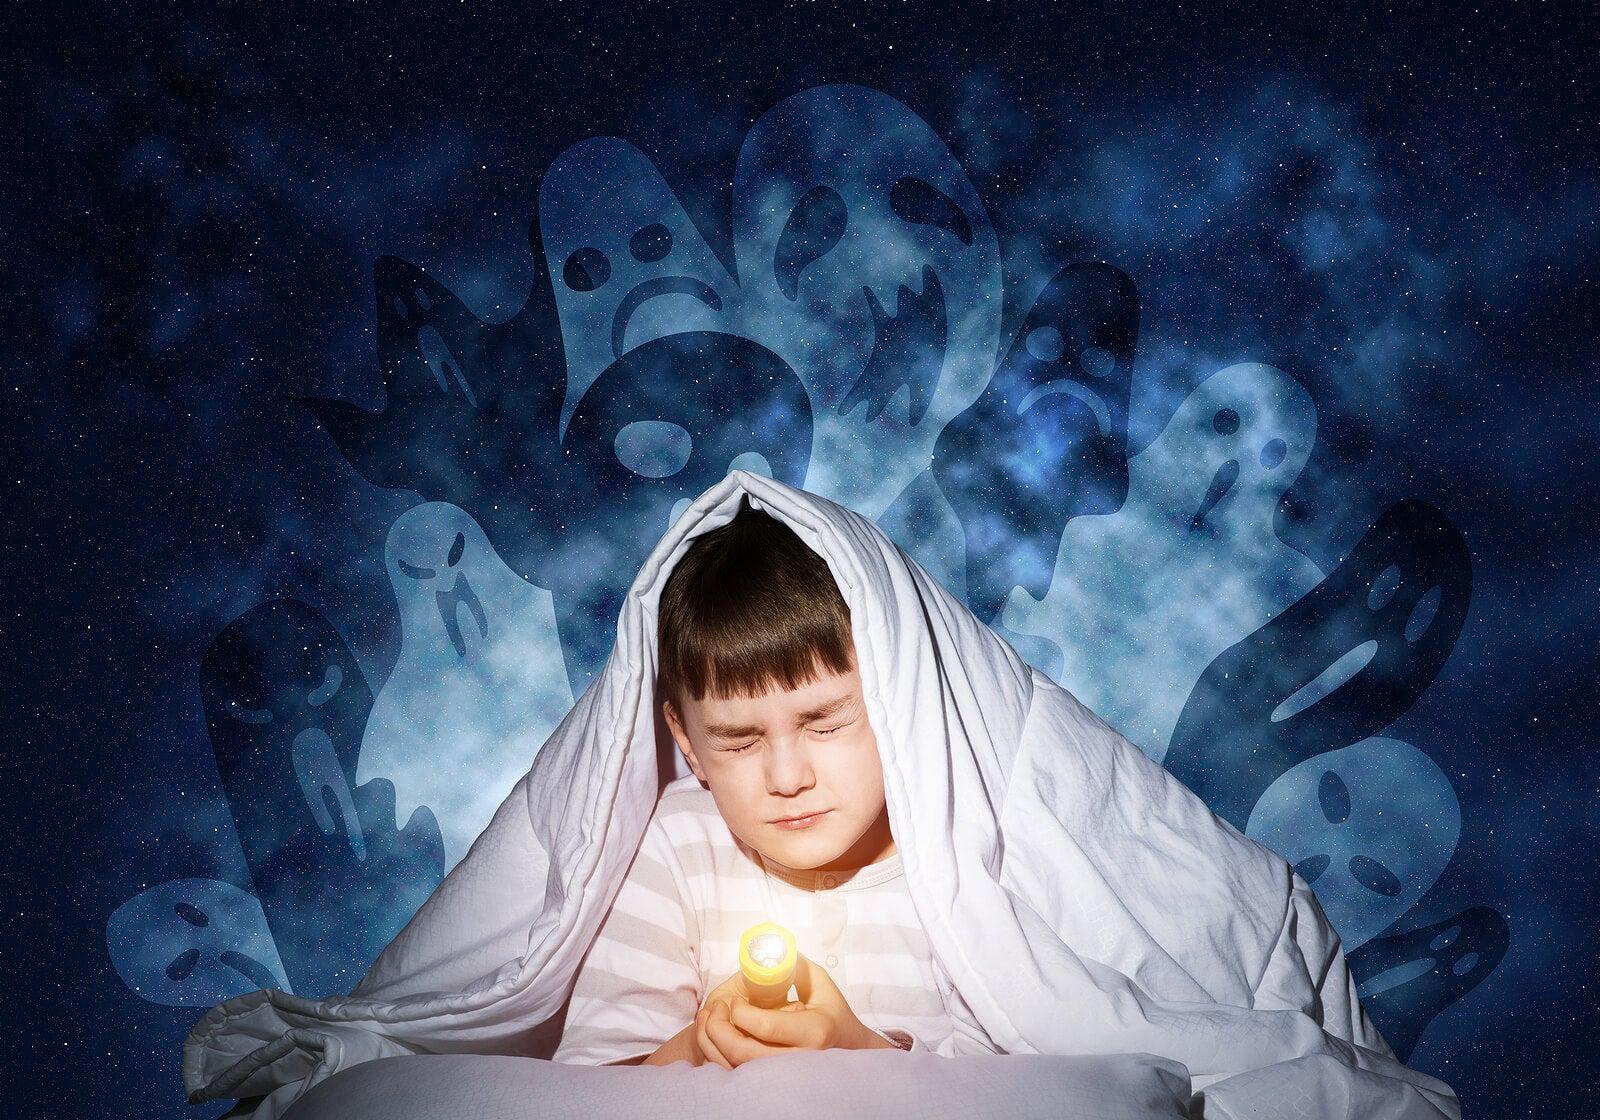 Niño con miedo a los fantasmas se tapa con la sábana en la cama.